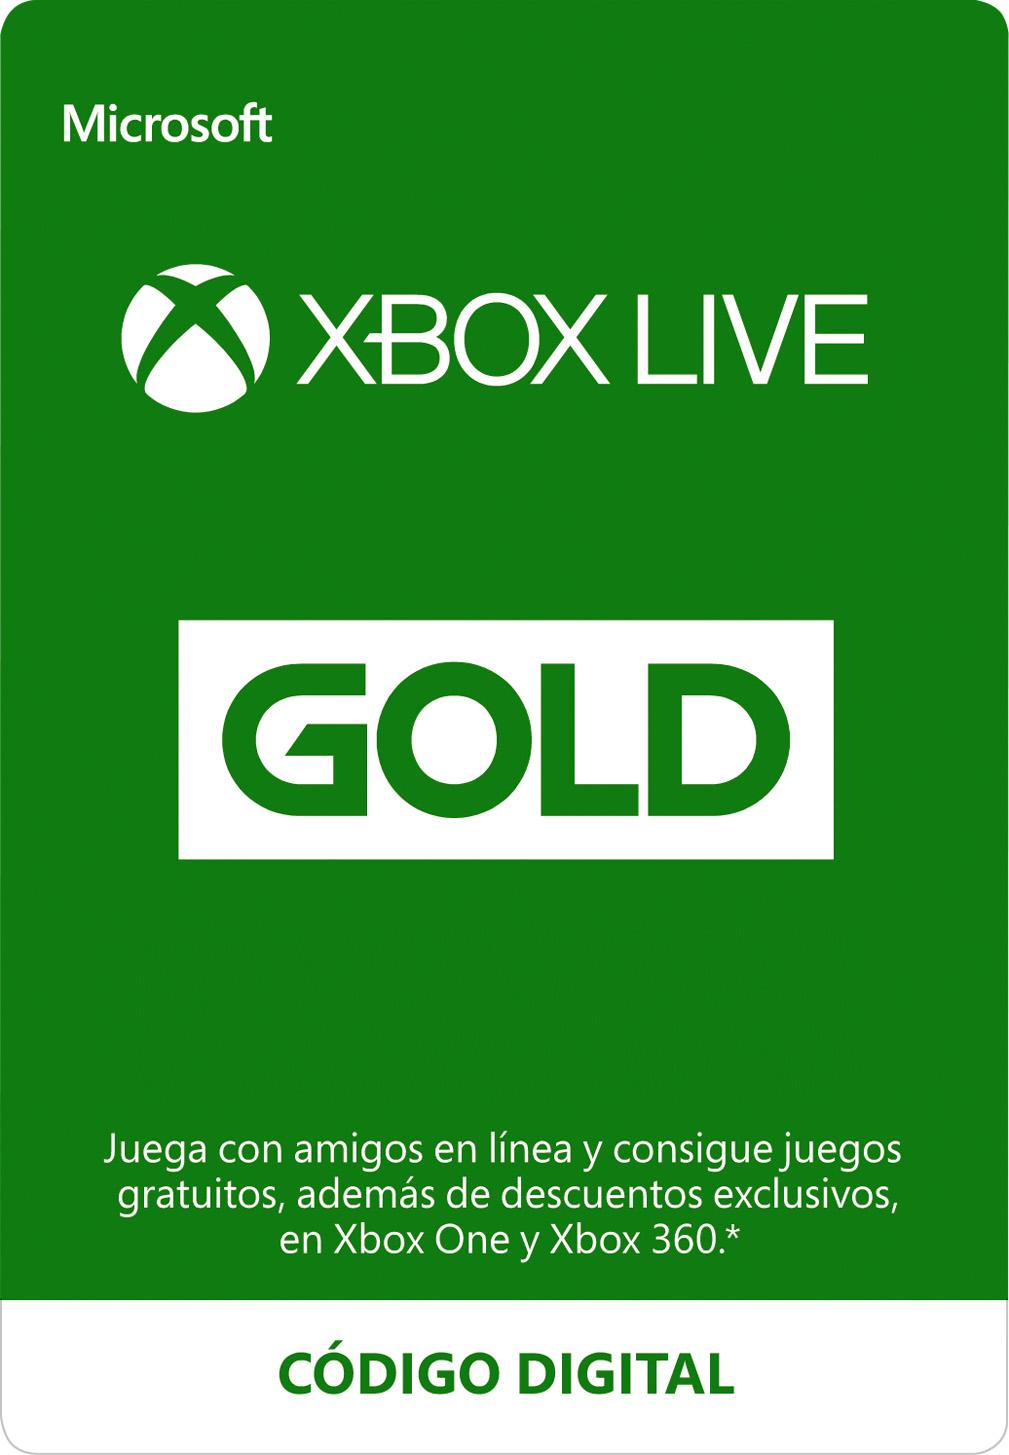 Suscripción a Xbox Live Gold (código digital)